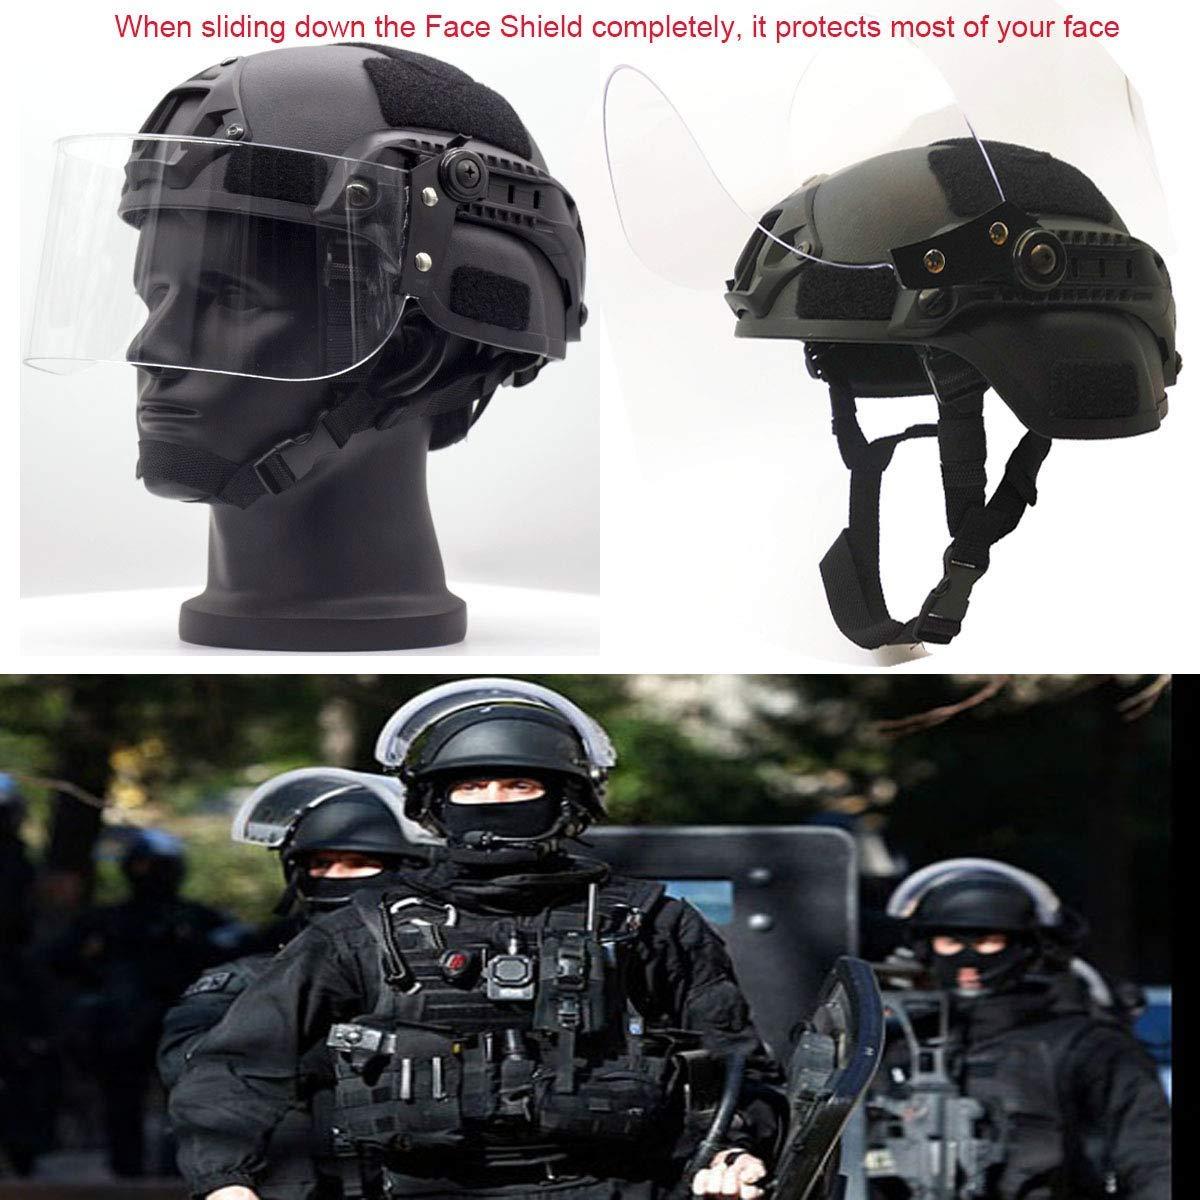 CS Transparent Anti-Visage Airsoft Protection Police Paintball Militaire SWAT Patrol Riot Helmet Rziioo Casque Tactique avec Masque de Protection